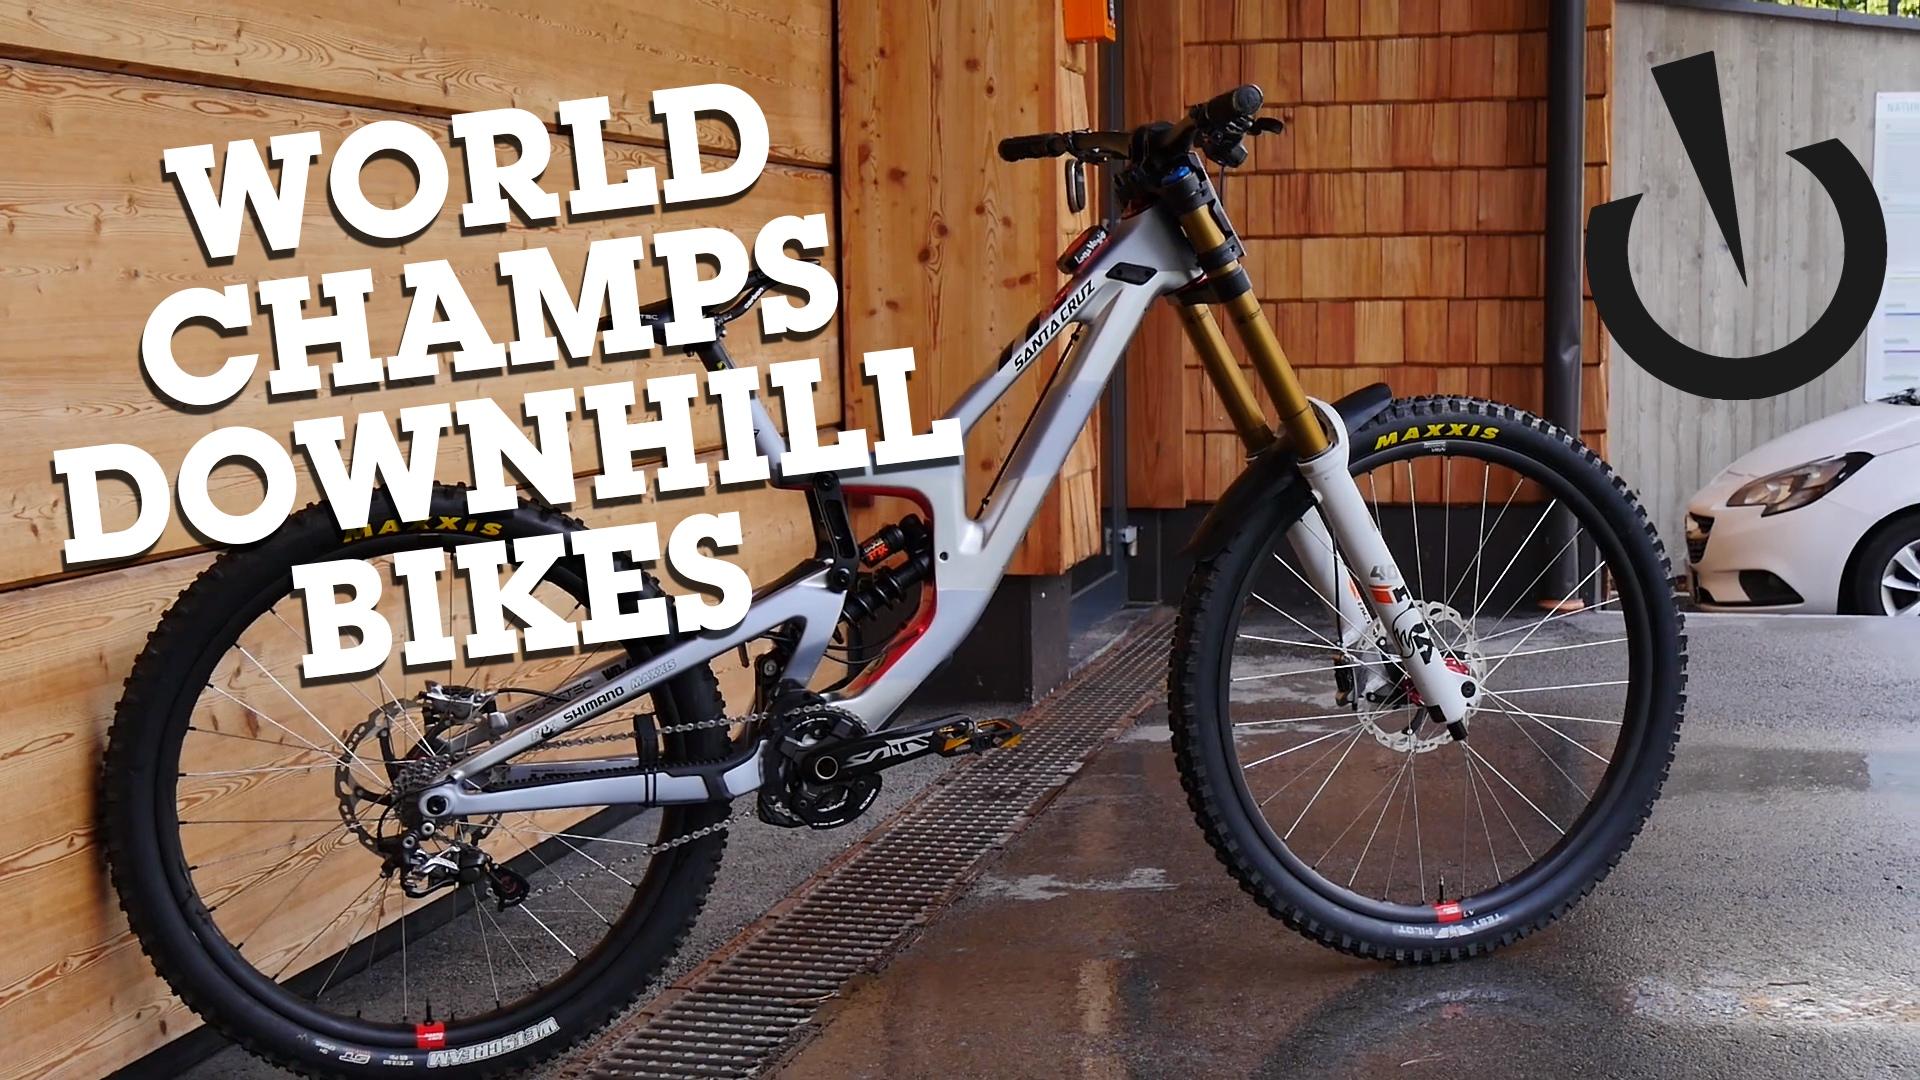 World Champs Downhill Bikes - Leogang 2020